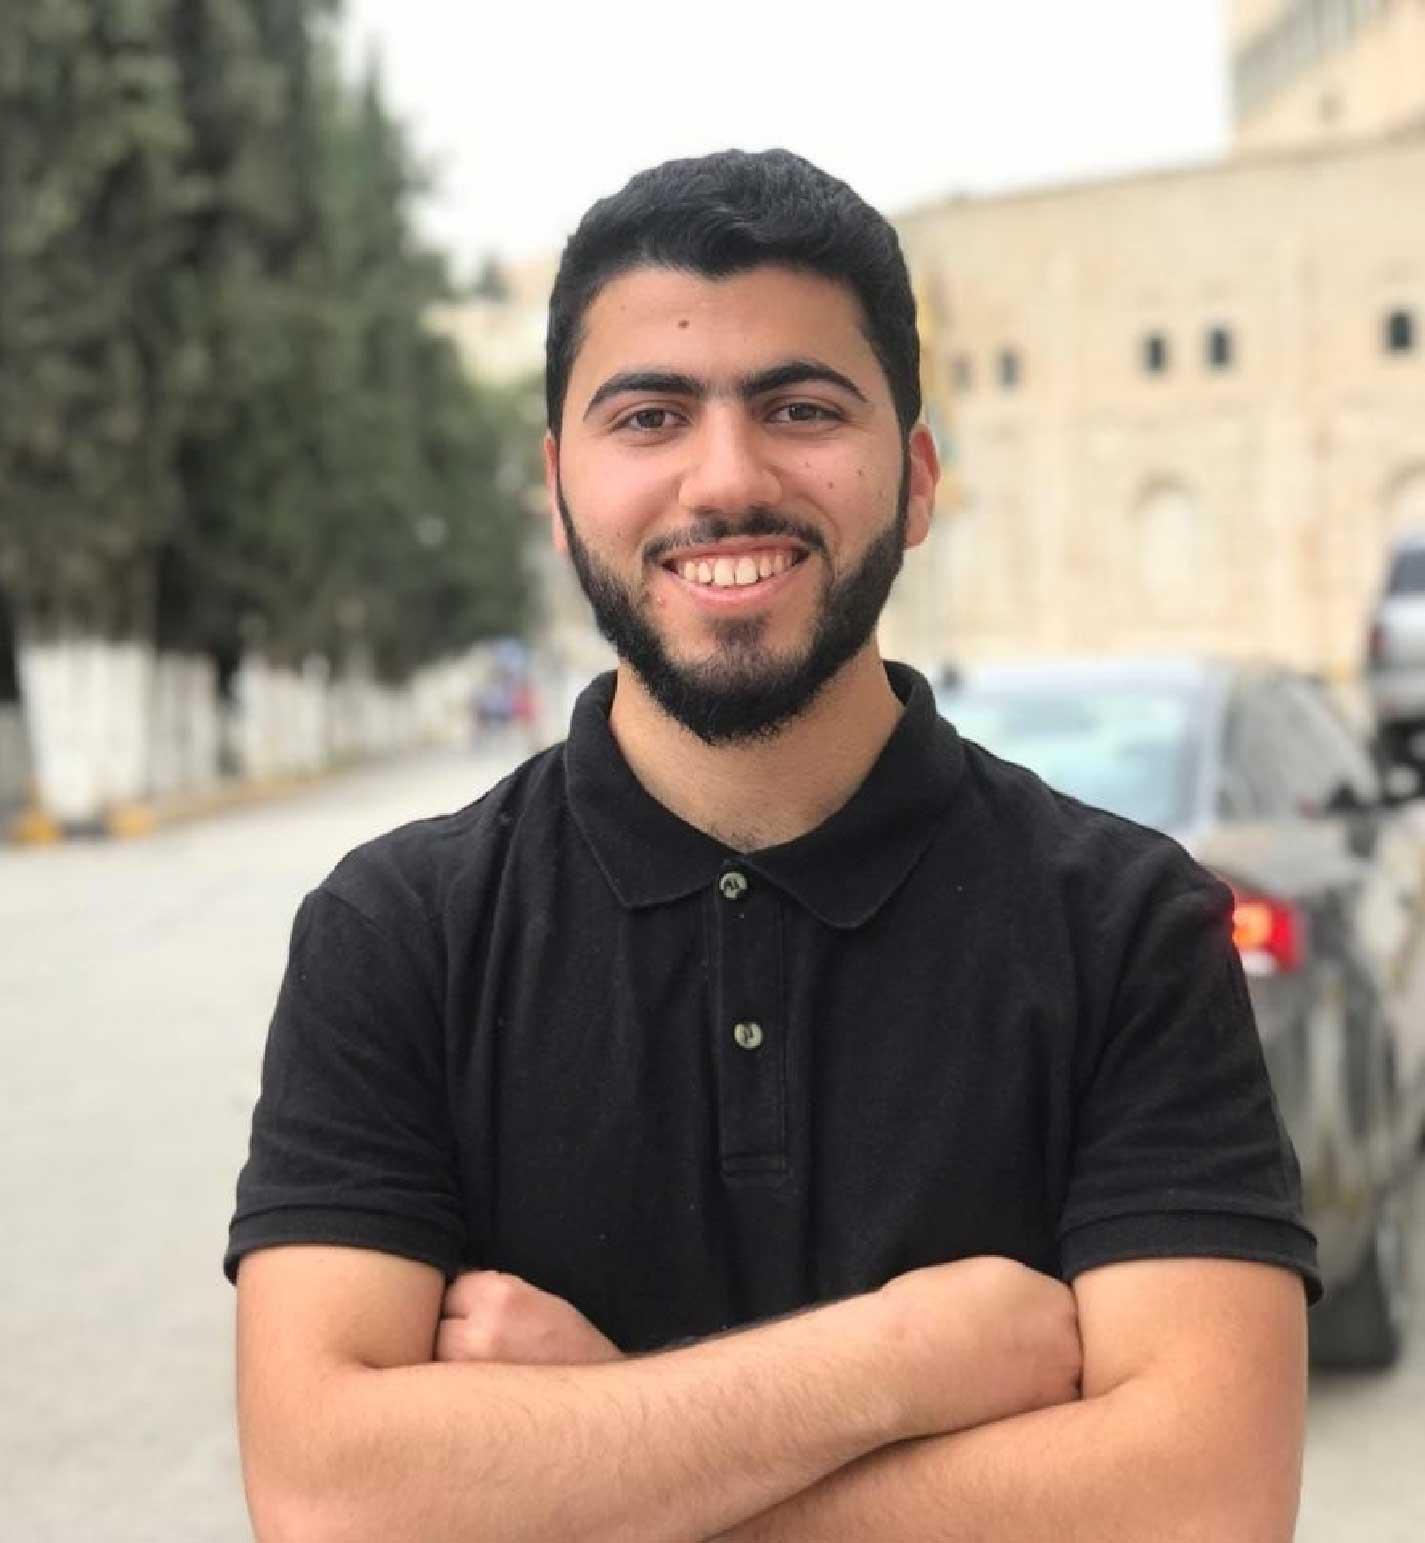 Anas Ibrahim Abu-Arqoub